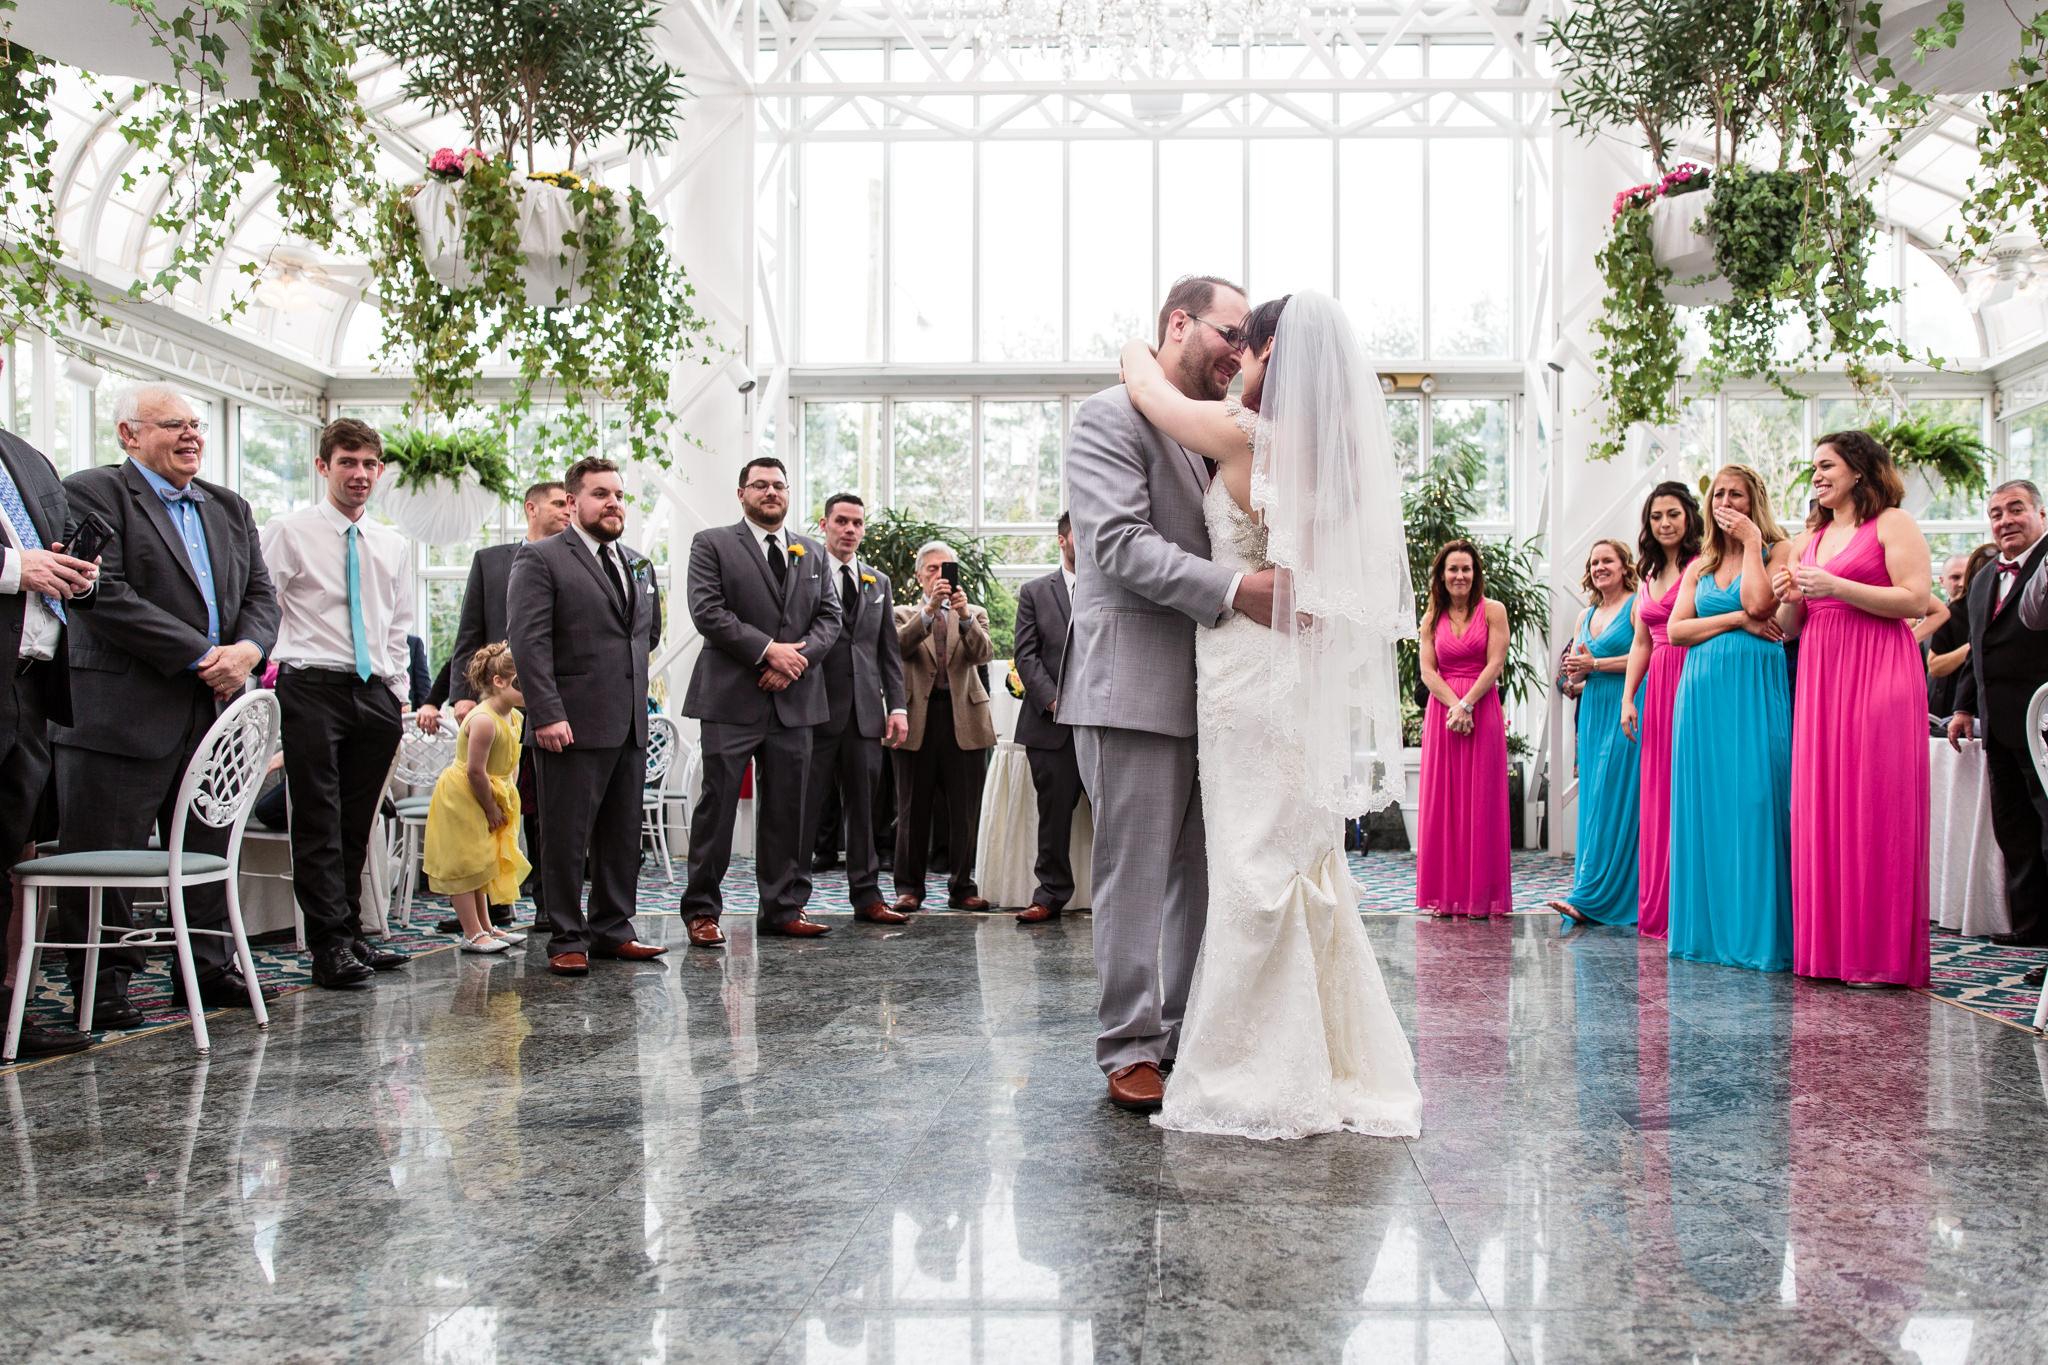 Hanchar_Madison_Hotel_NJ_Wedding_2C0A8023.jpg